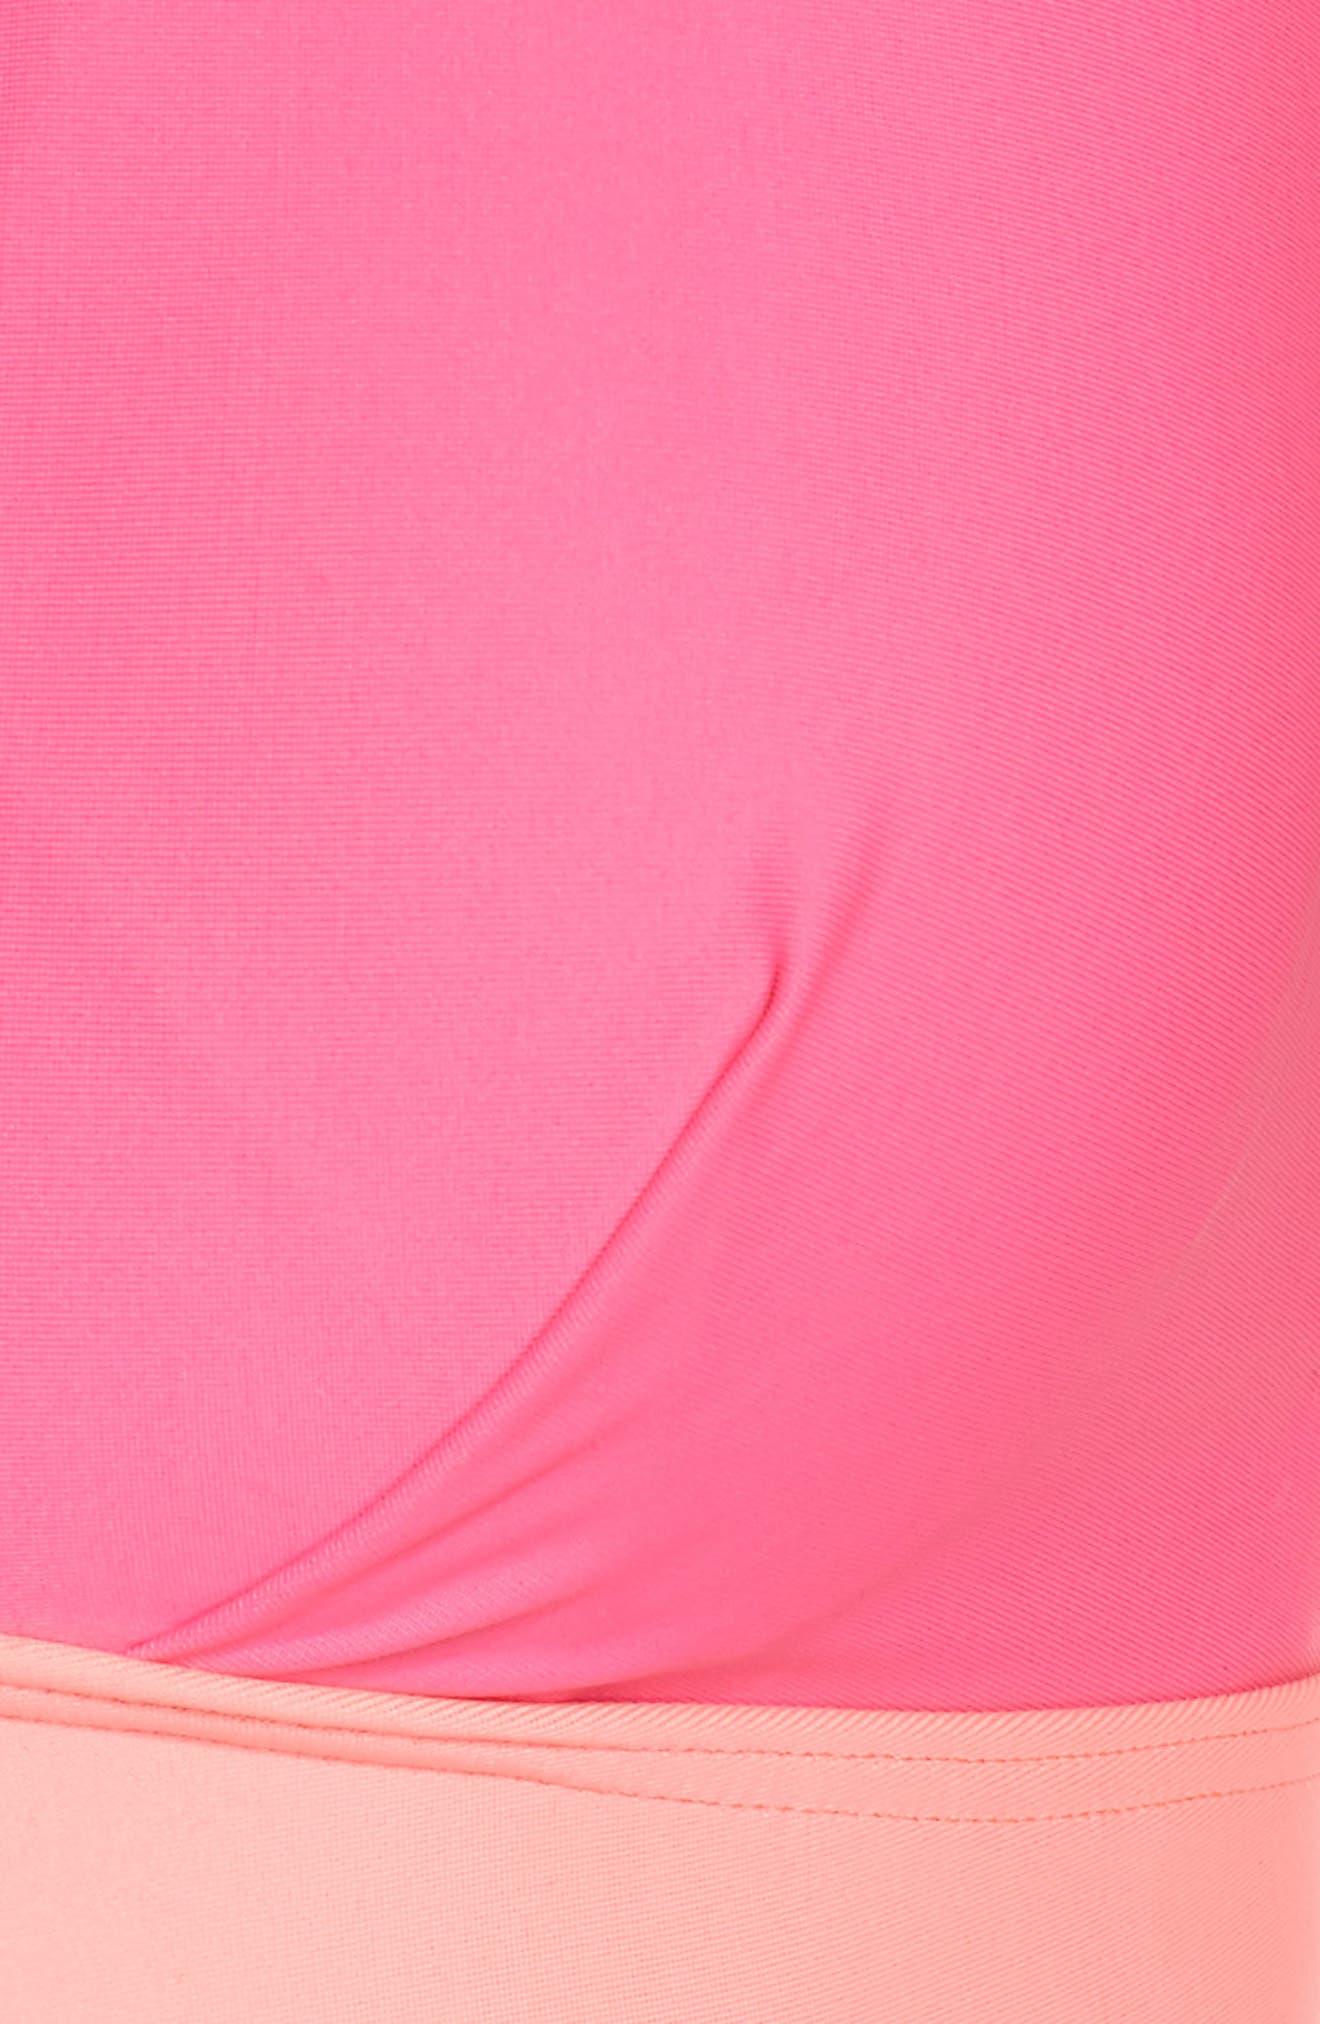 Contrast Bikini Top,                             Alternate thumbnail 8, color,                             Neon Pink